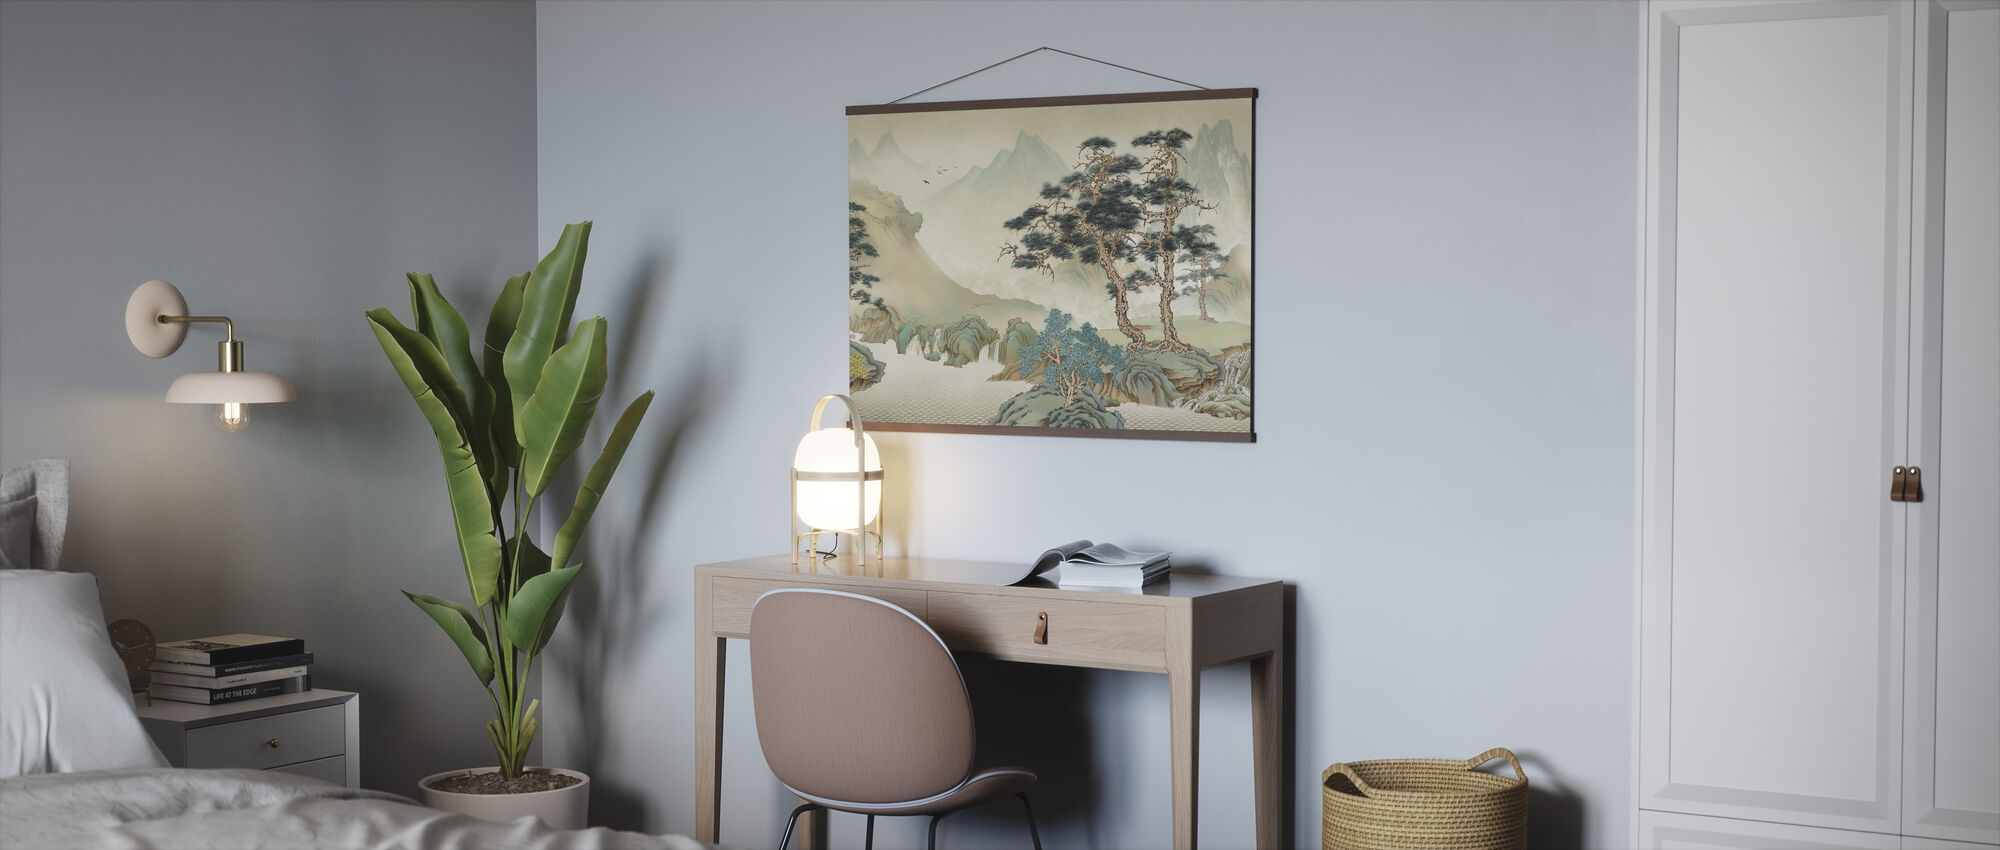 Jiangs Landskap - Poster - Kontor